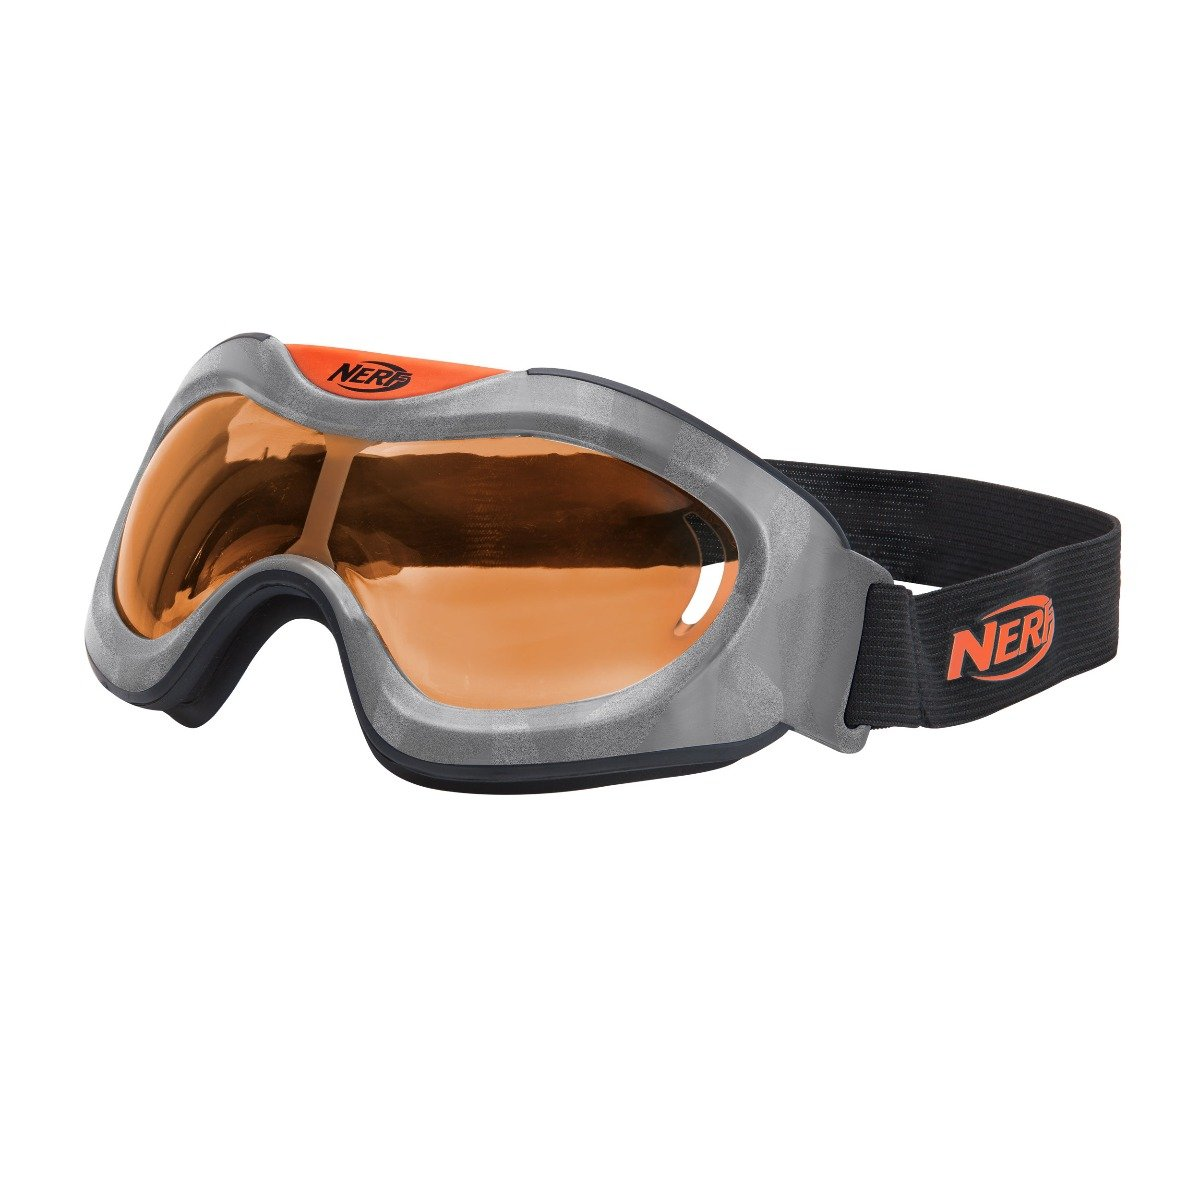 Ochelari de protectie Nerf Elite, Portocaliu